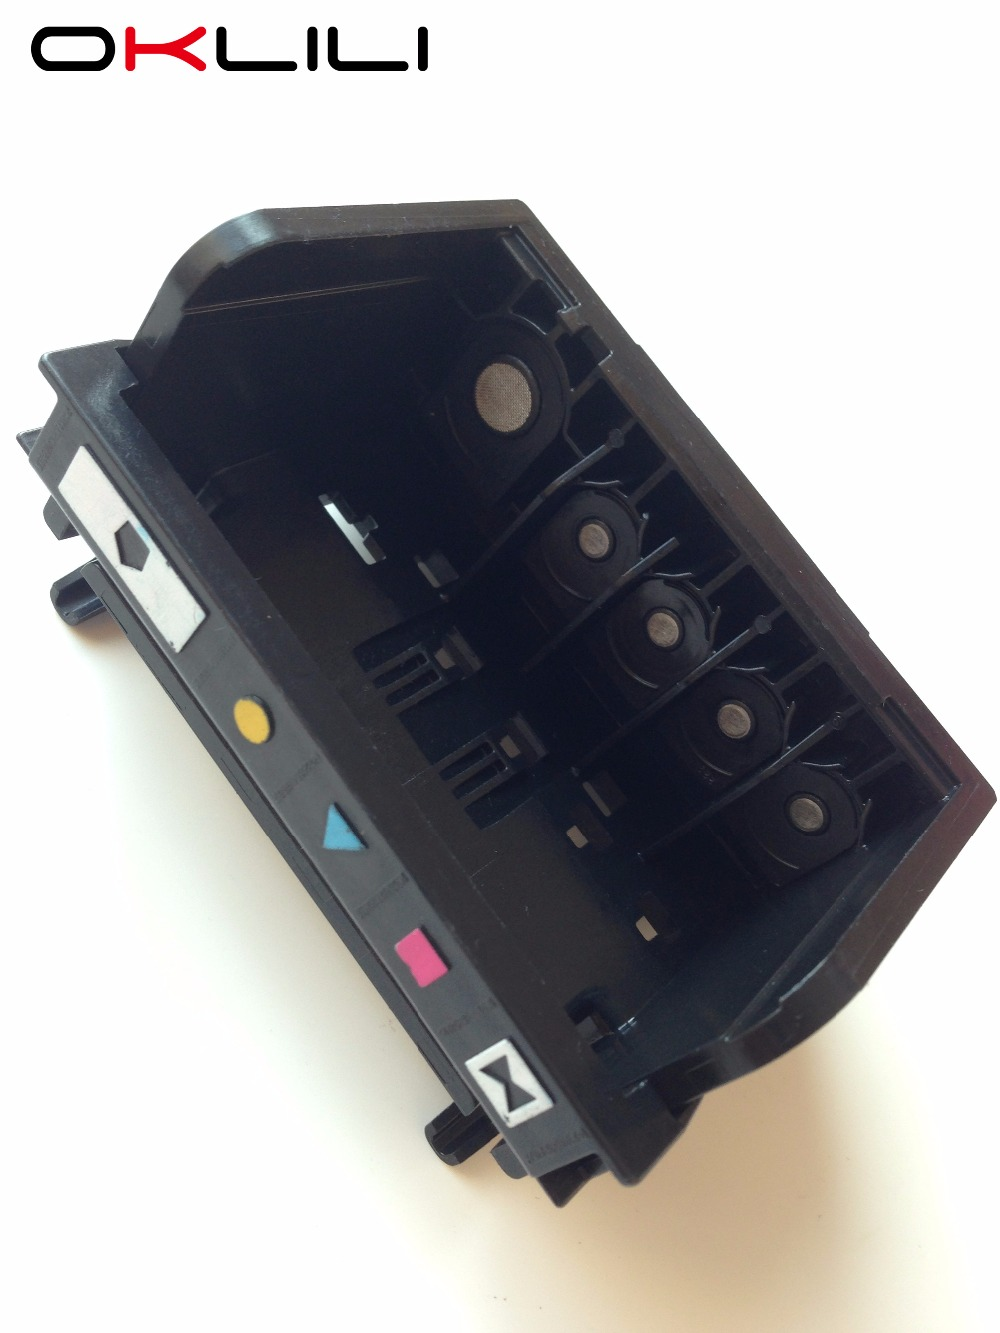 CB326-30002 CN642A 564 564XL Druckkopf mit 5 Steckplätzen für HP 7510 7520 D5460 D7560 B8550 C5370 C5380 C6300 C6300 D5400 D7560